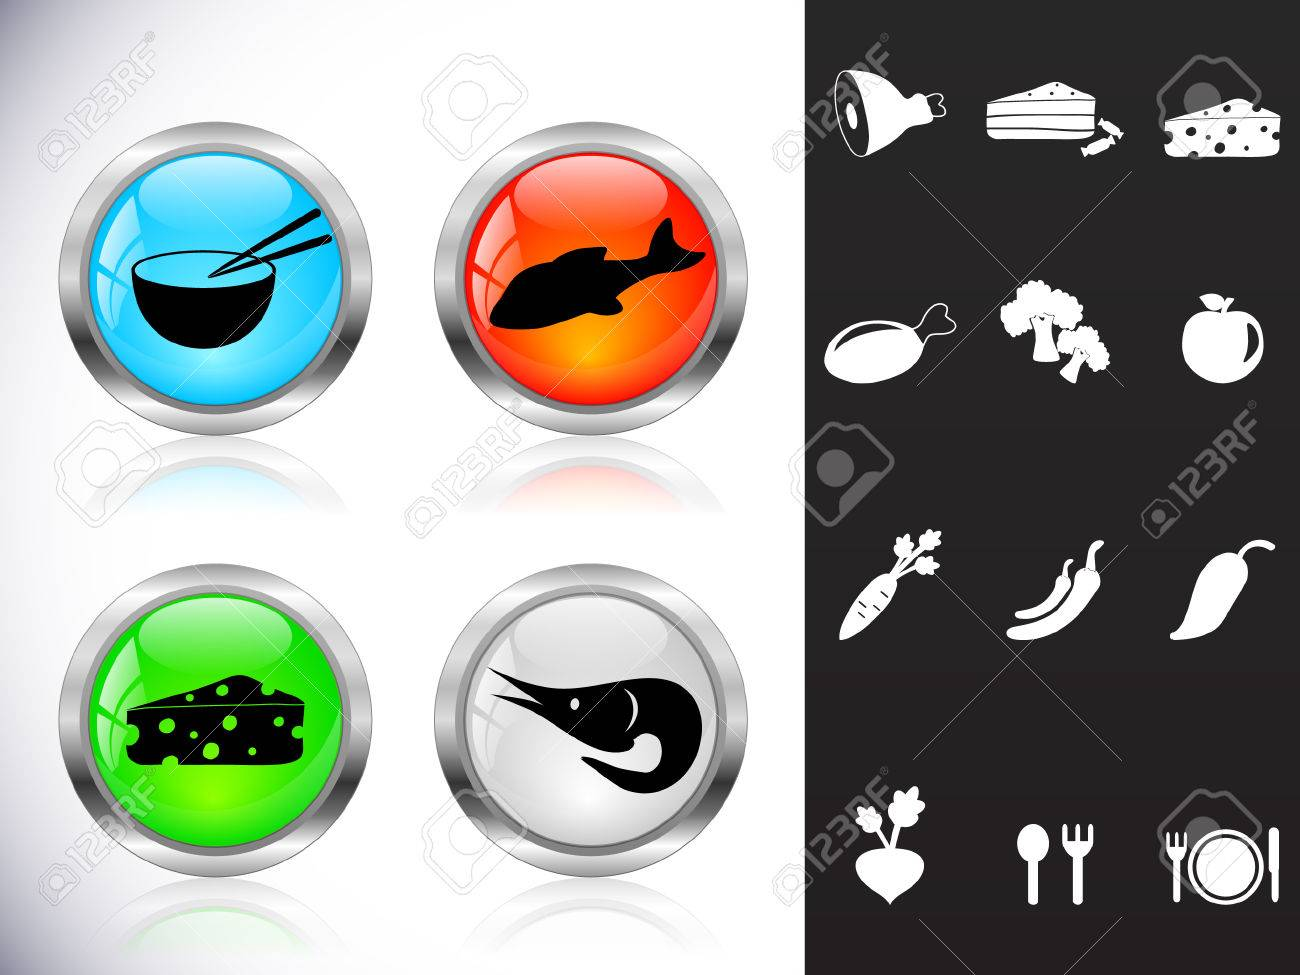 Web metal buttons, food symbols Stock Vector - 8976336